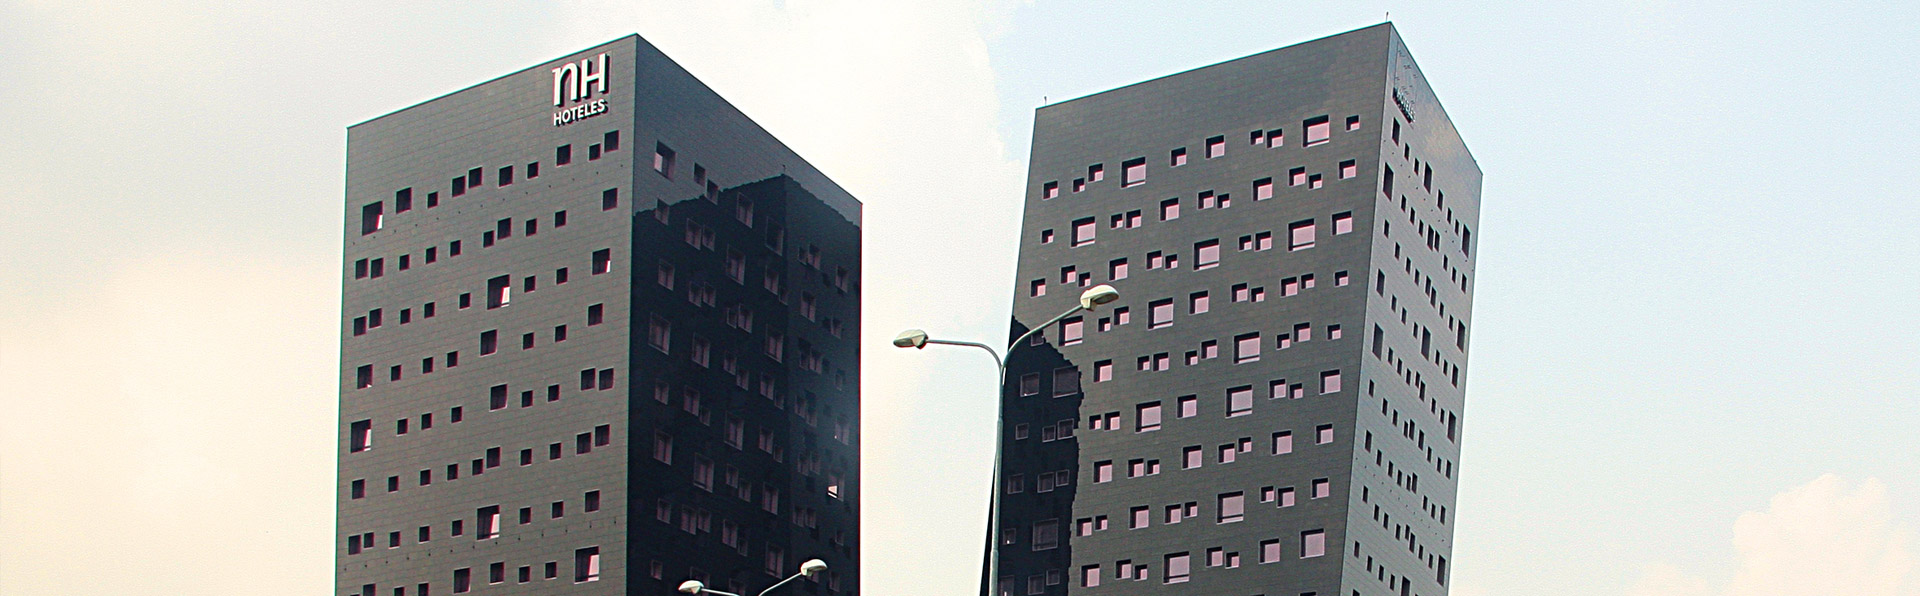 cmb-edilizia-construction-milan-albergo-fiera-trade-hotel